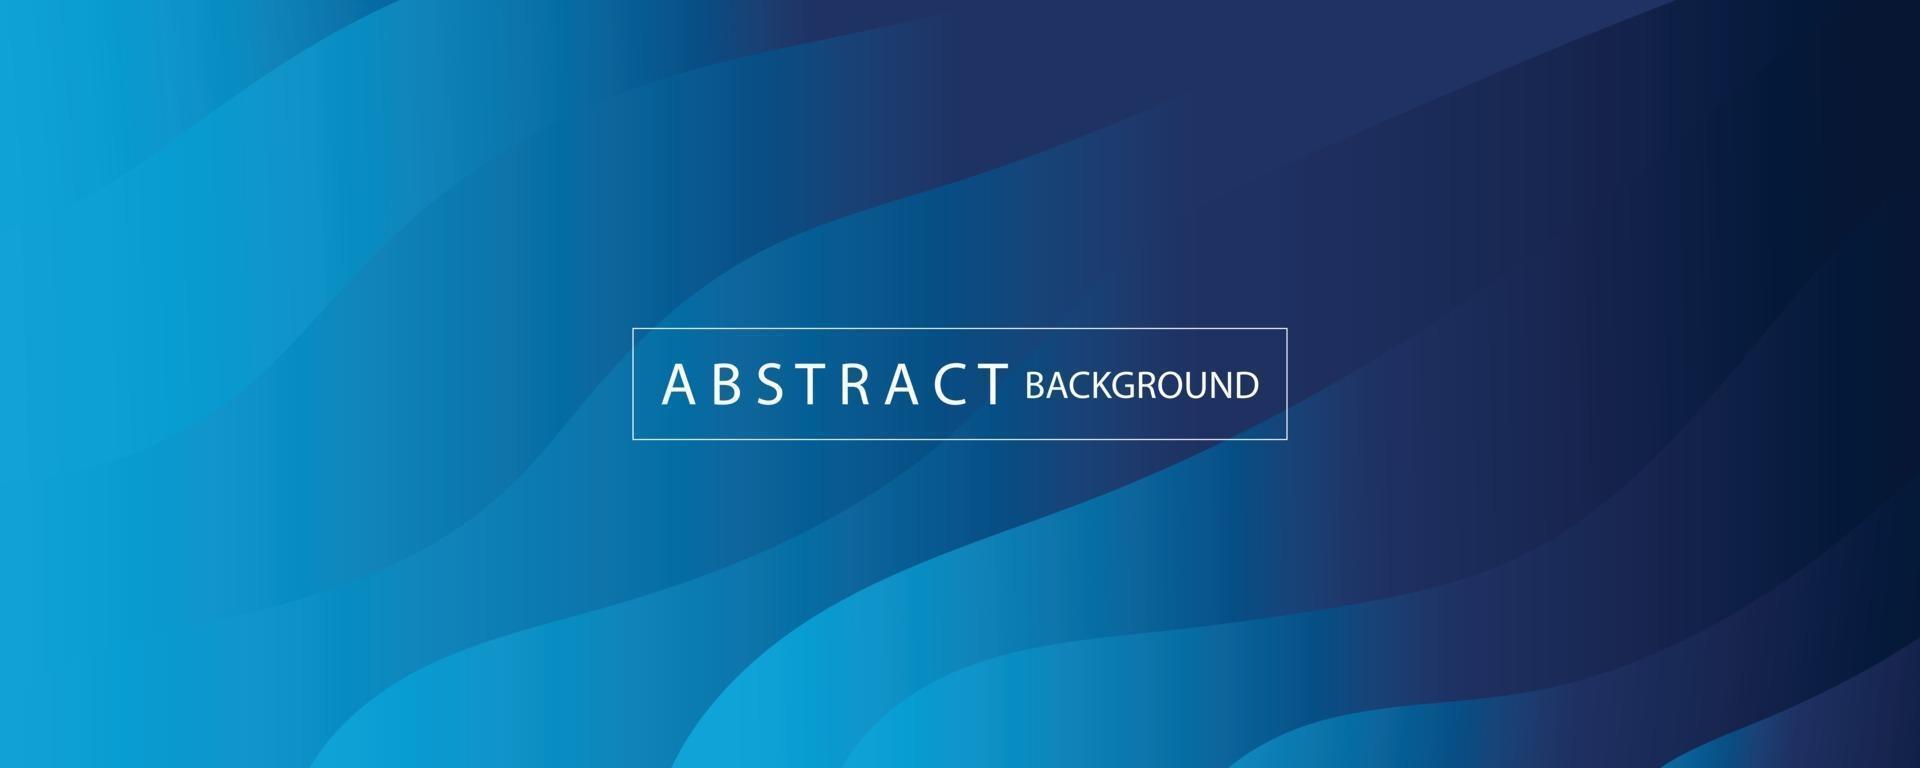 dark blue digital art and light in middle navy color design background vector